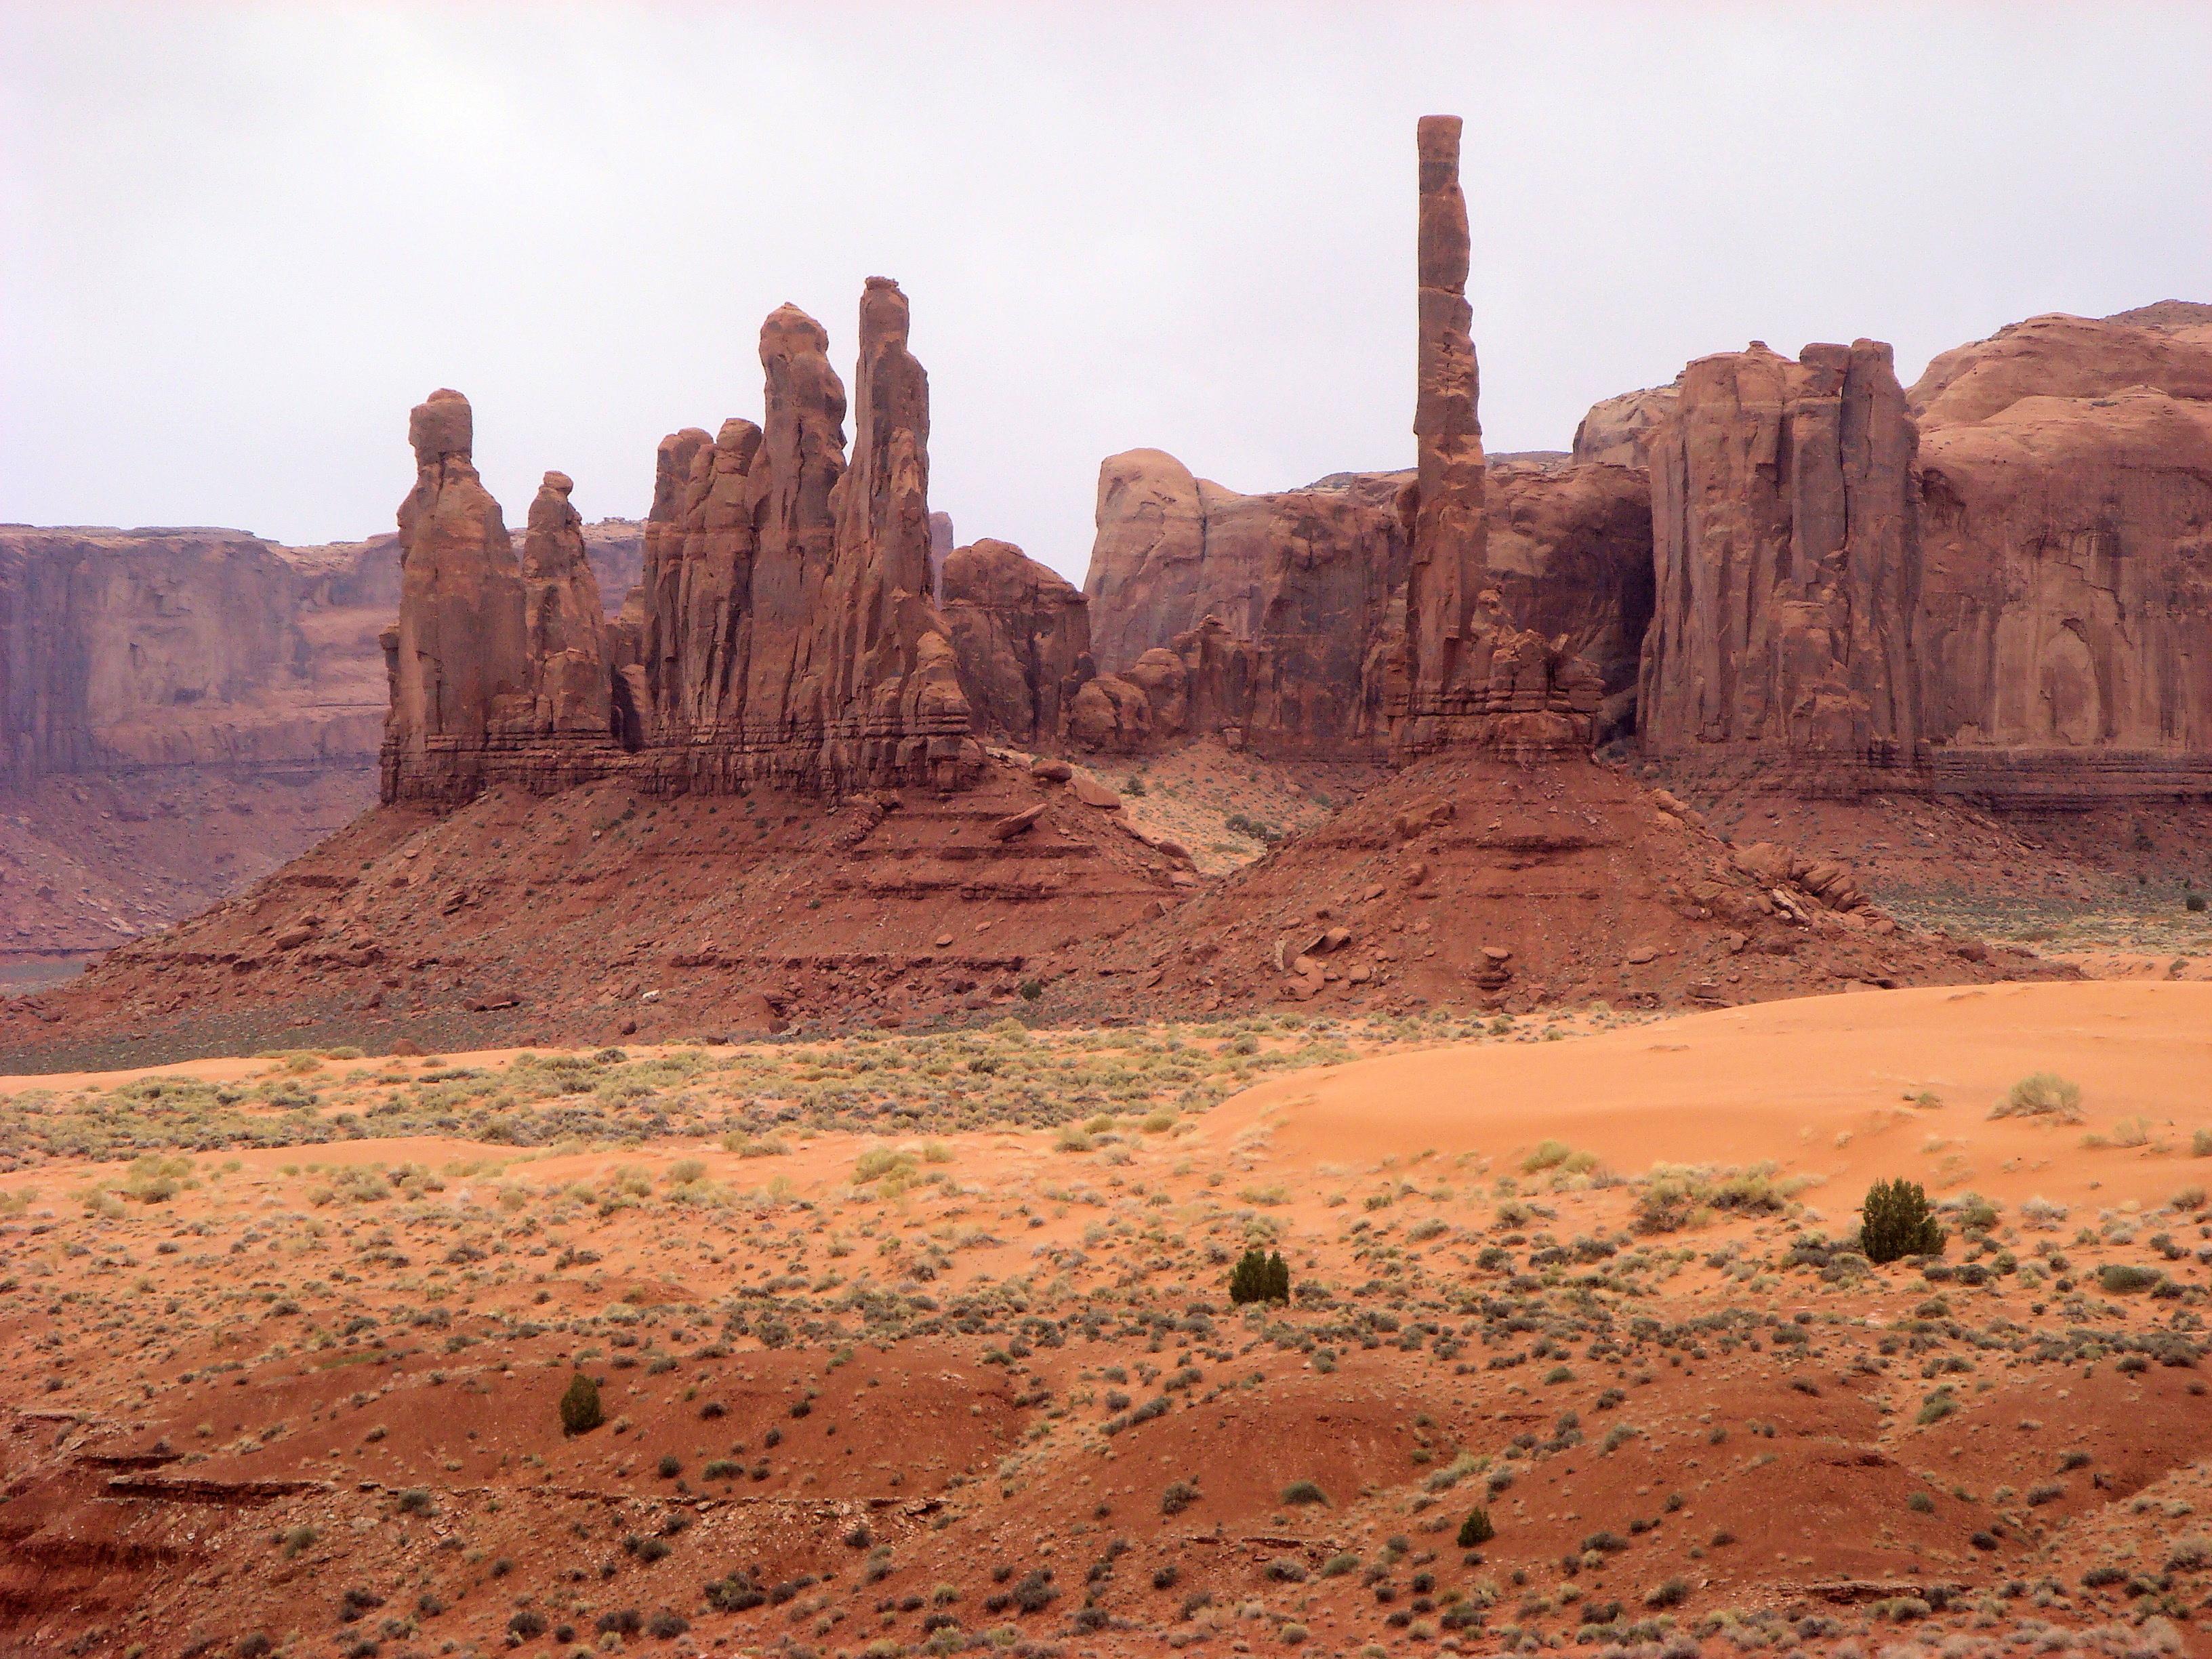 Historias gratis Milfs del desierto